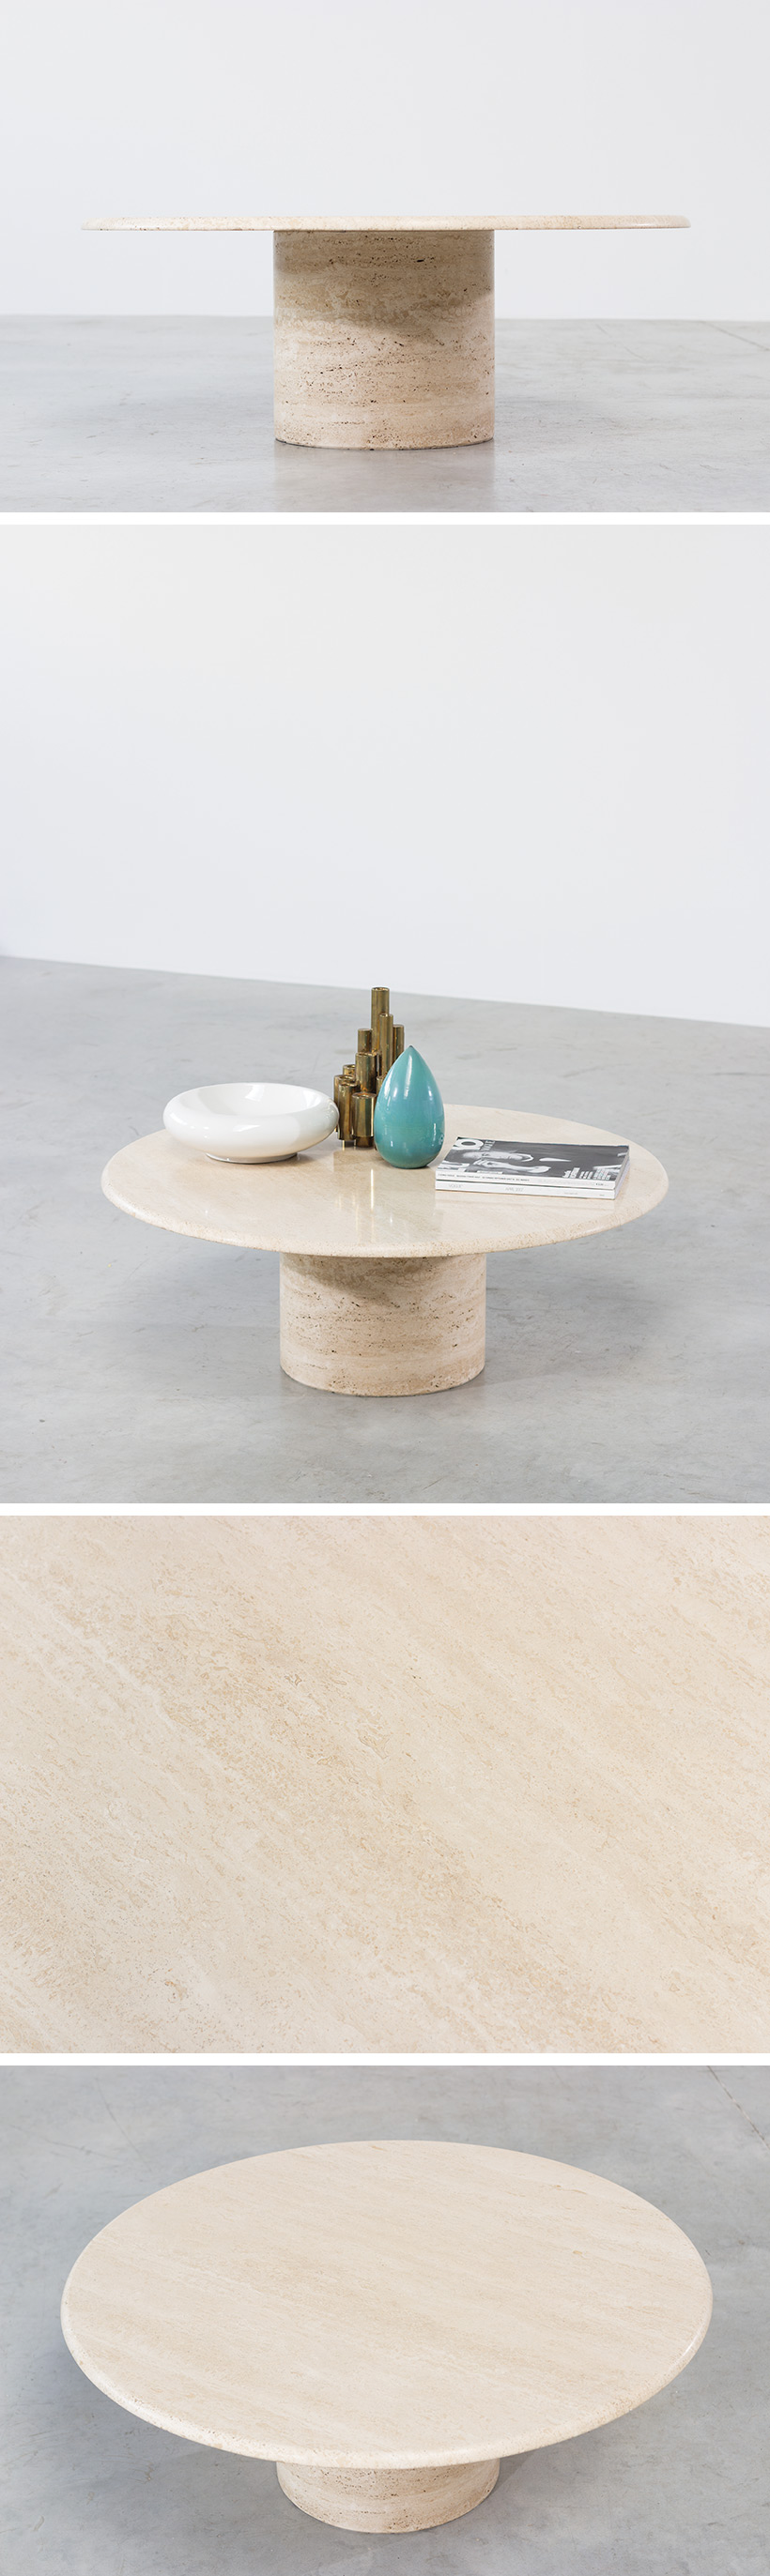 UP UP Mid Century Modern travertine coffee table circa 1970 Large